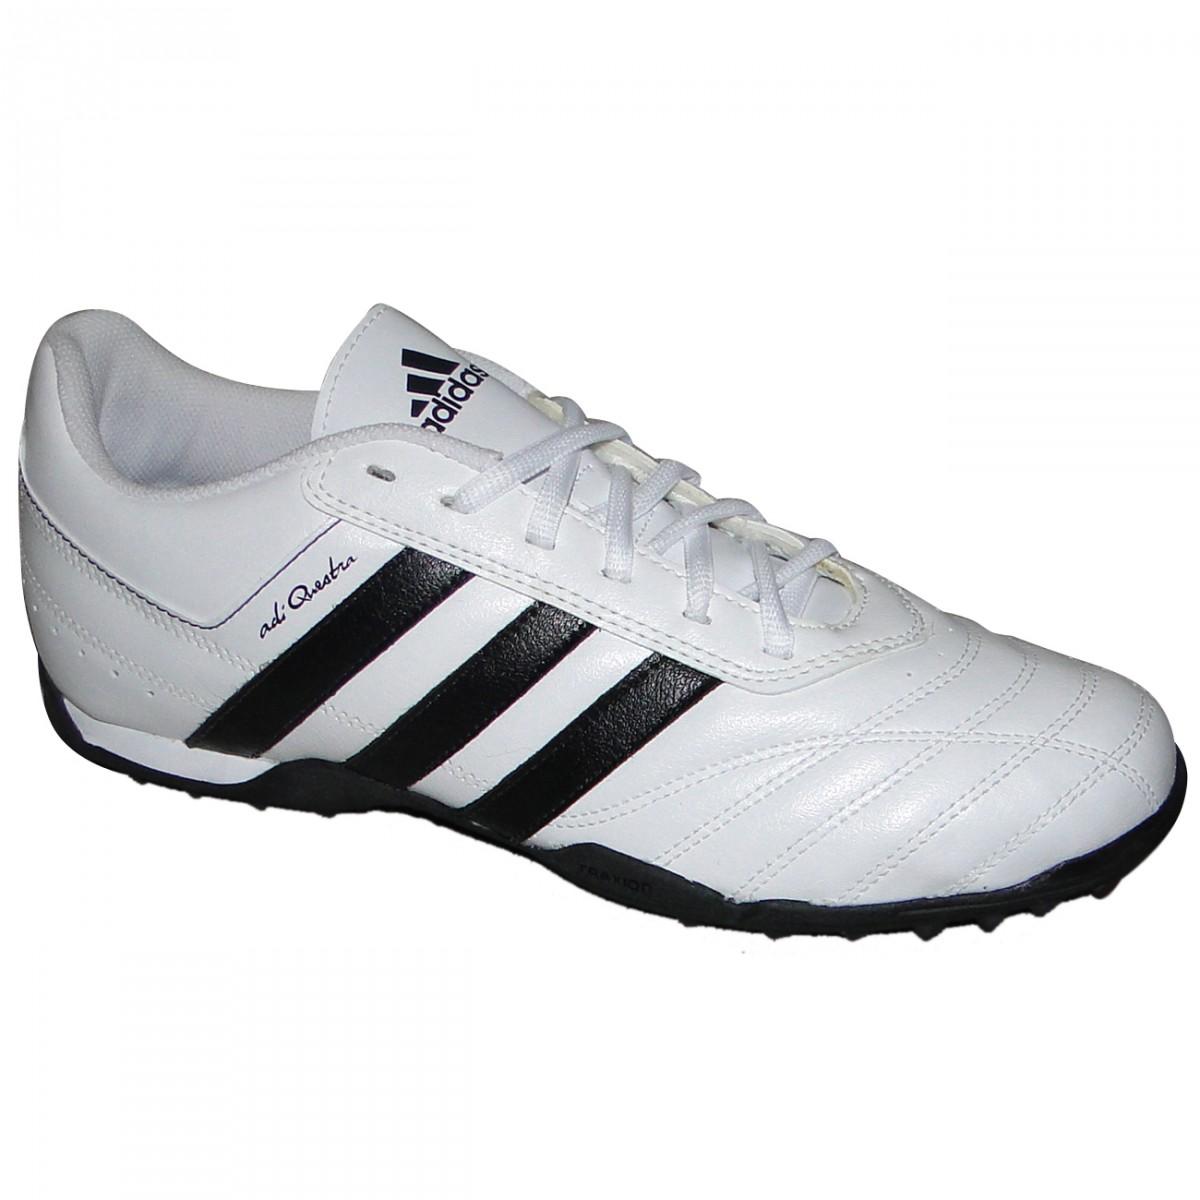 Chuteira Society Adidas Adiquestra 7153 - BRANCO PRETO - Chuteira Nike 5894824cf907c